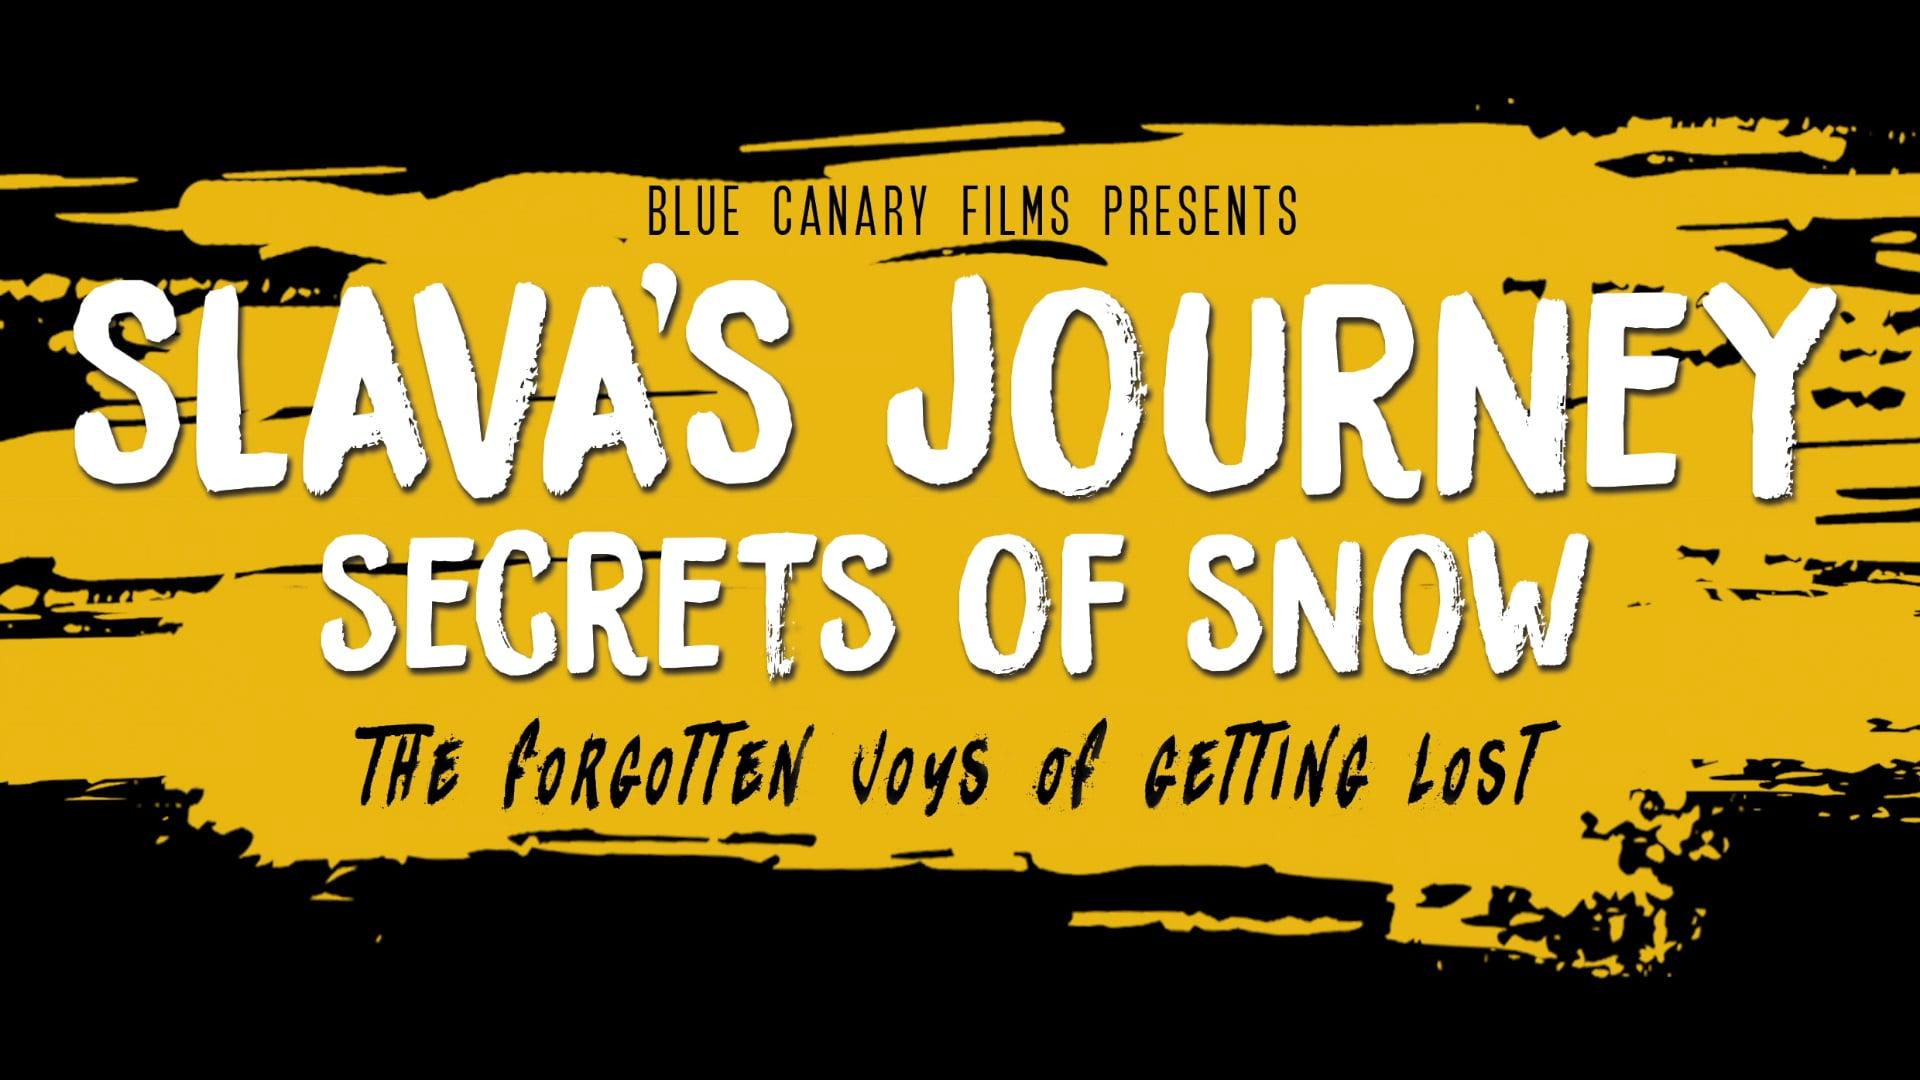 1 Slava's Journey Trailer with Helena Bonham Carter narration